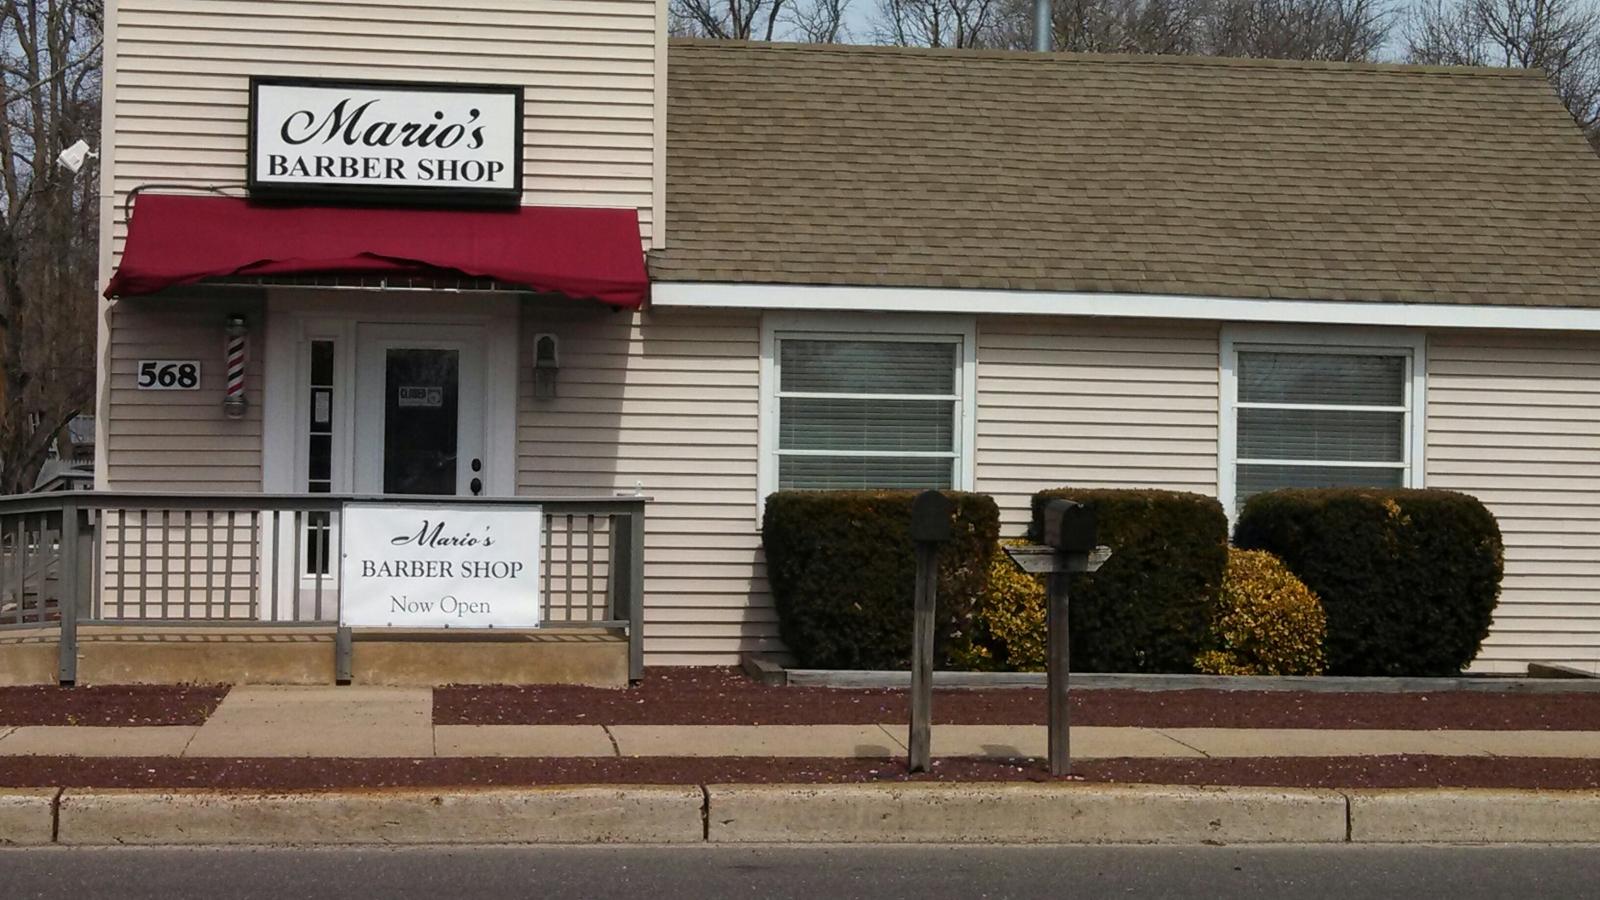 Mario's Barber Shop in Manahawkin